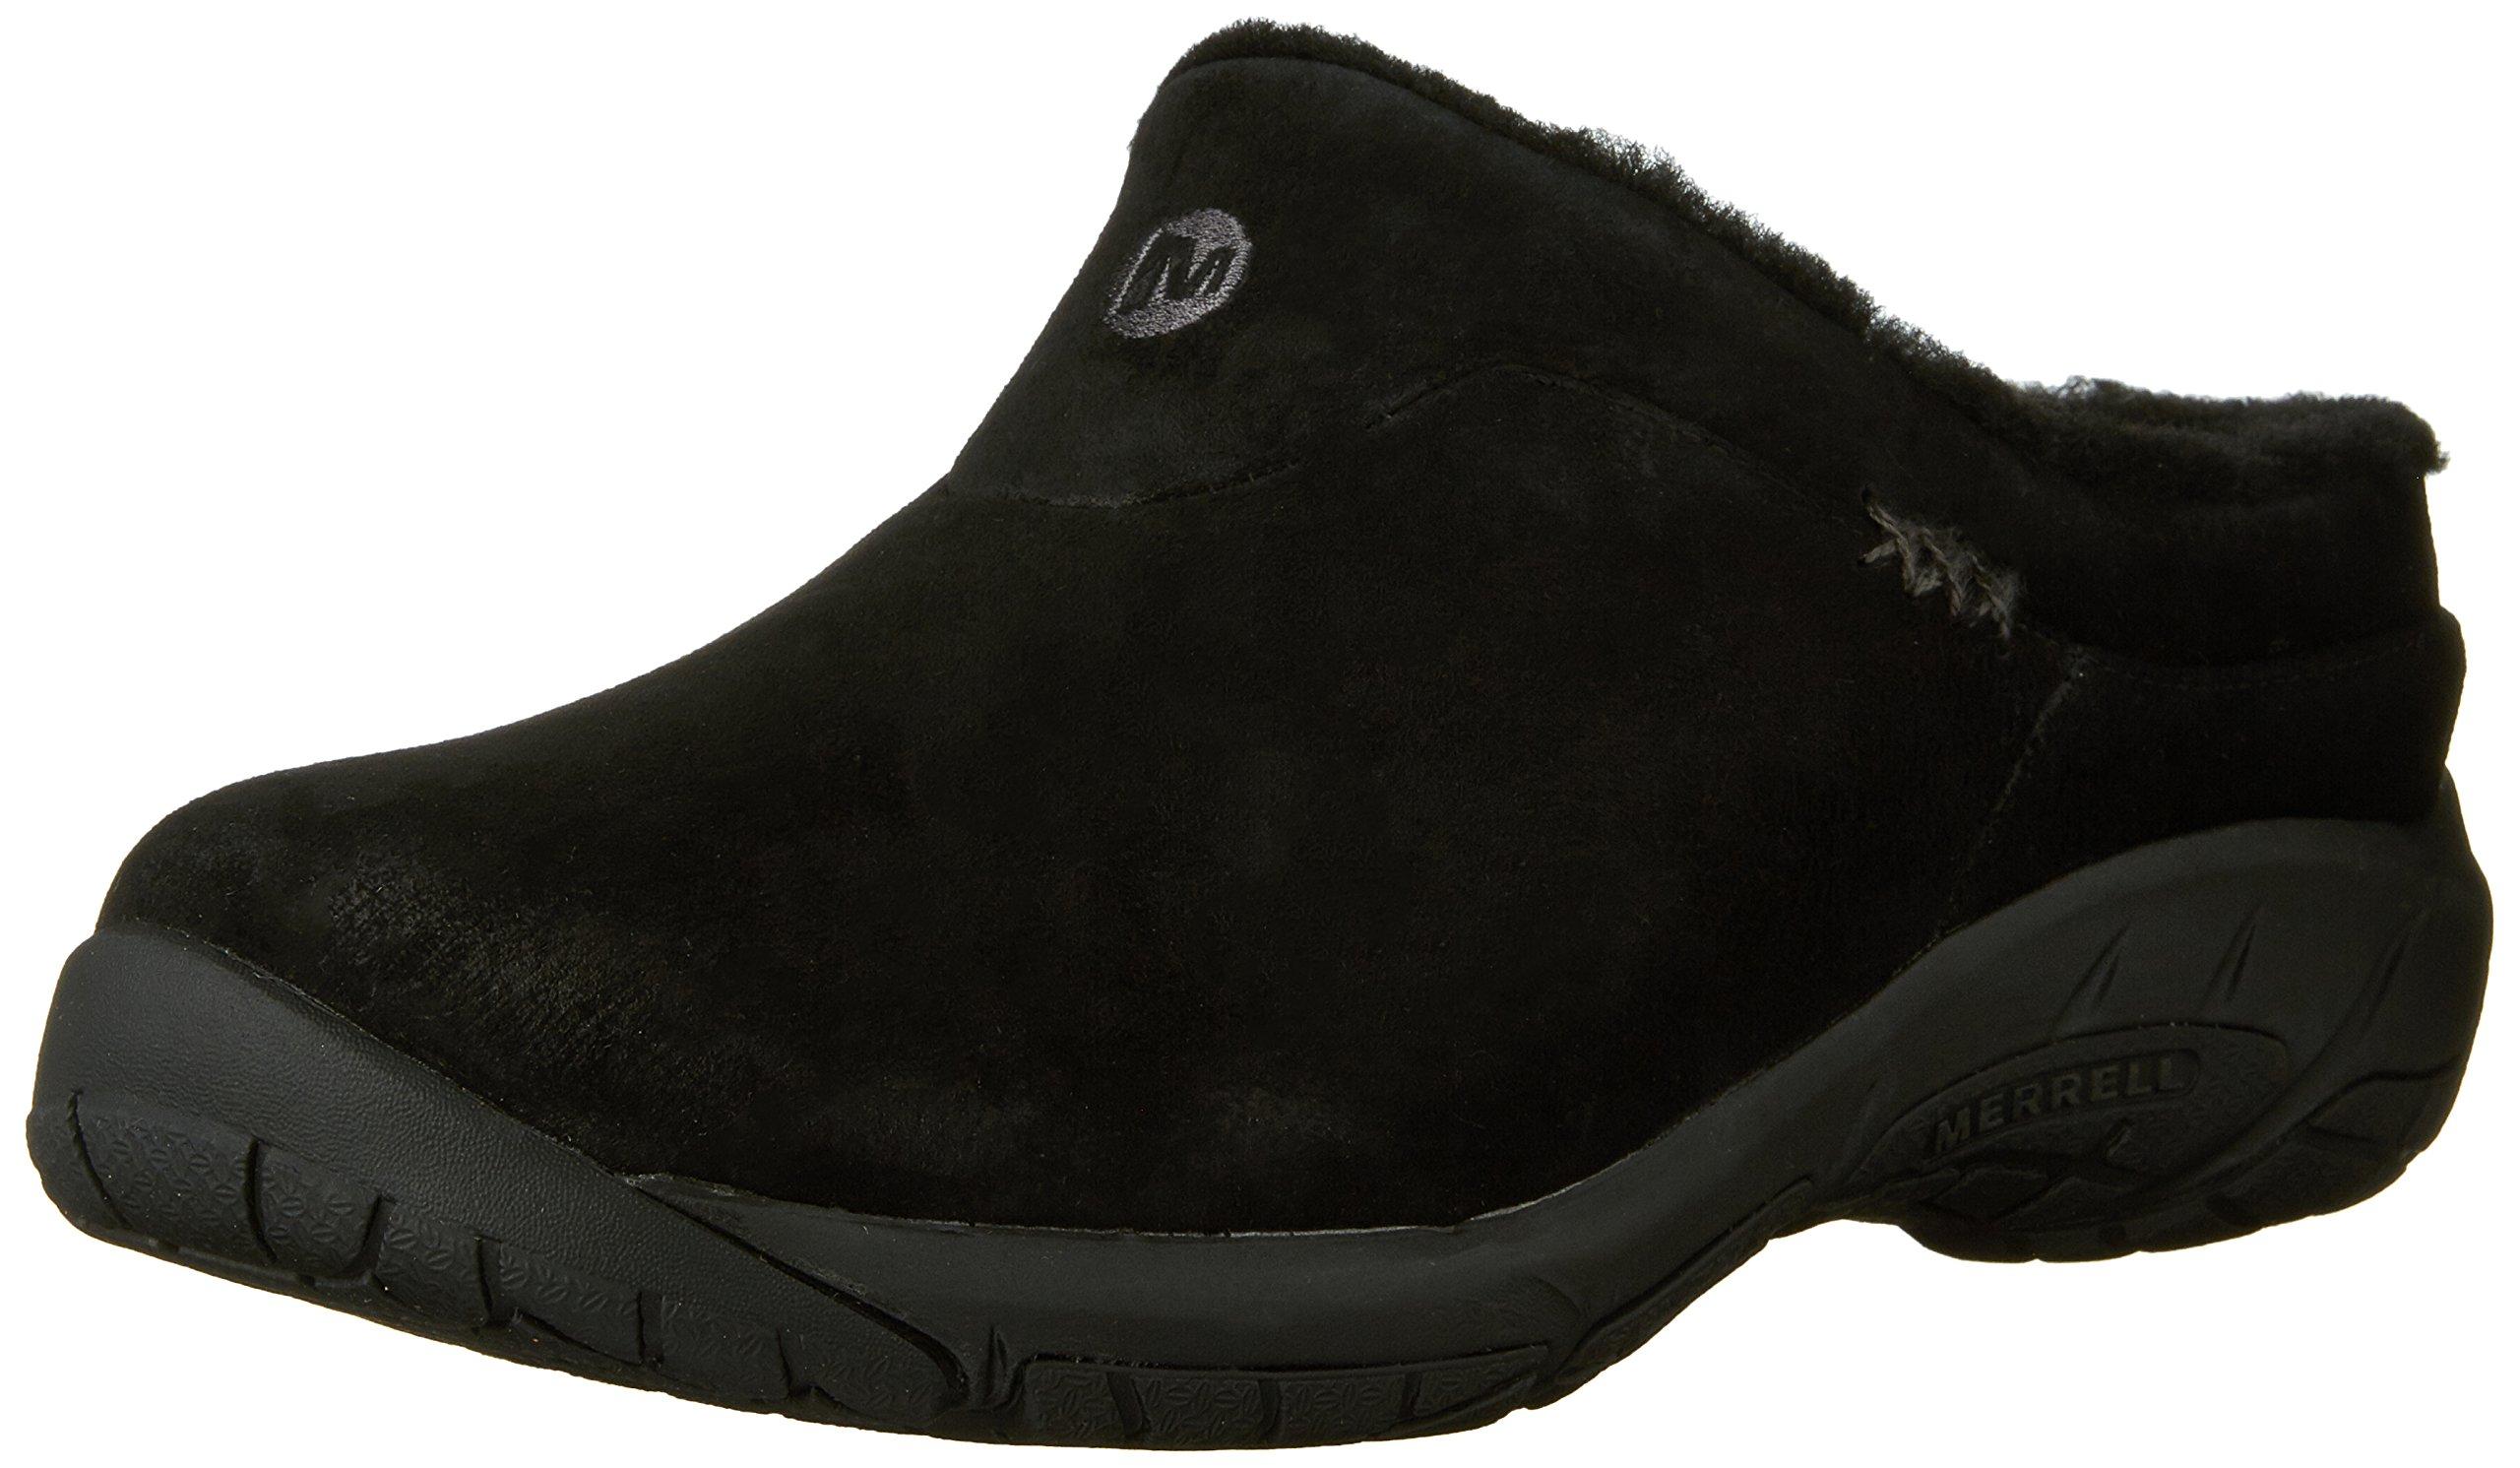 Merrell Women's Encore Ice Slip-On Shoe,Black Suede Leather,7 M US